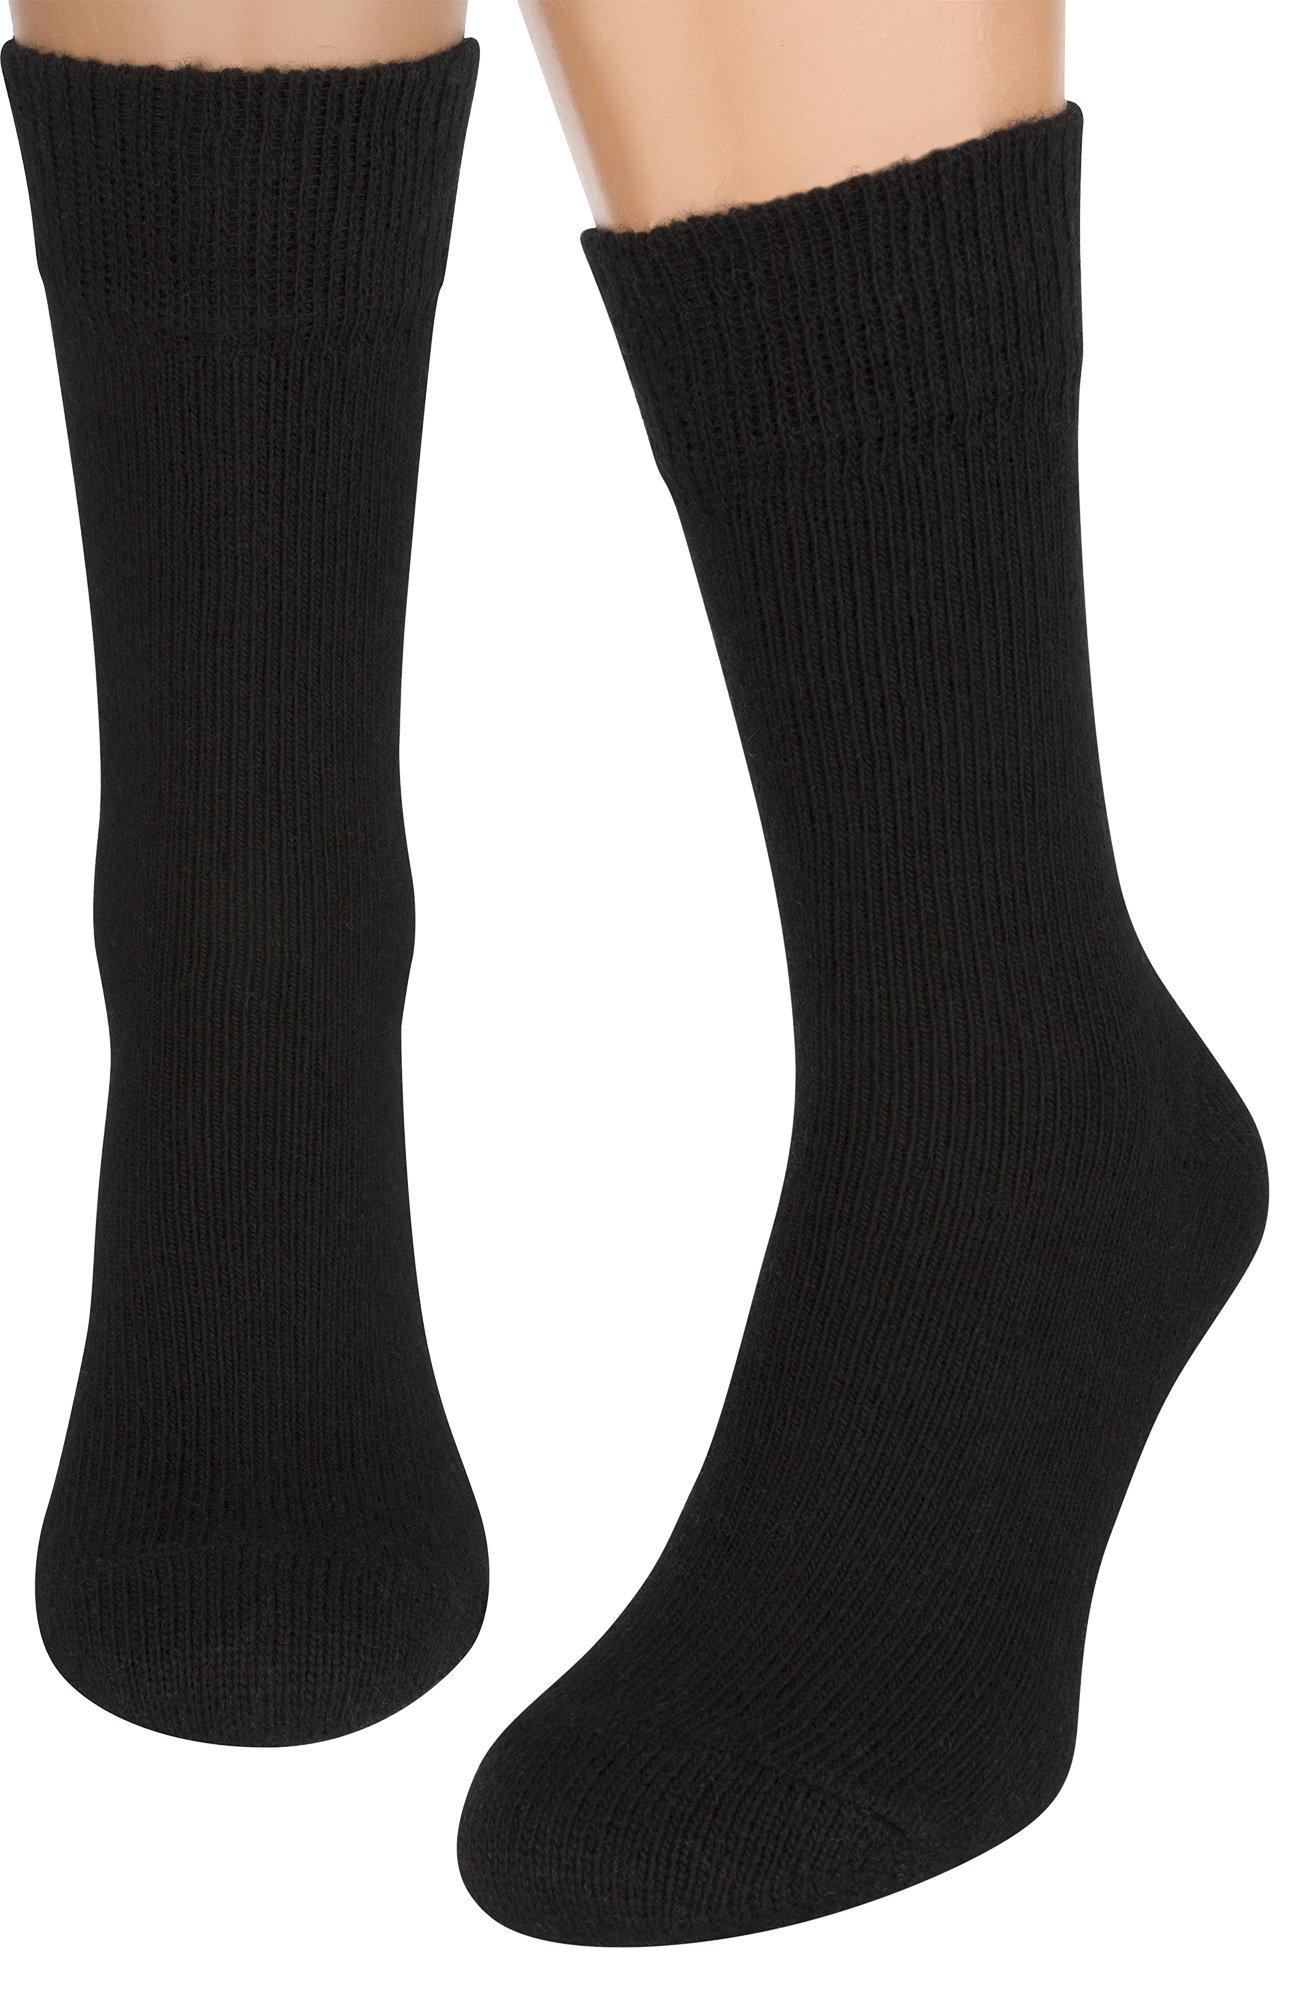 Wool Hiking Socks, 2 packs Mens & Womens Thermal Merino Warm Boot Sox, AIR SOCKS (Black XL)